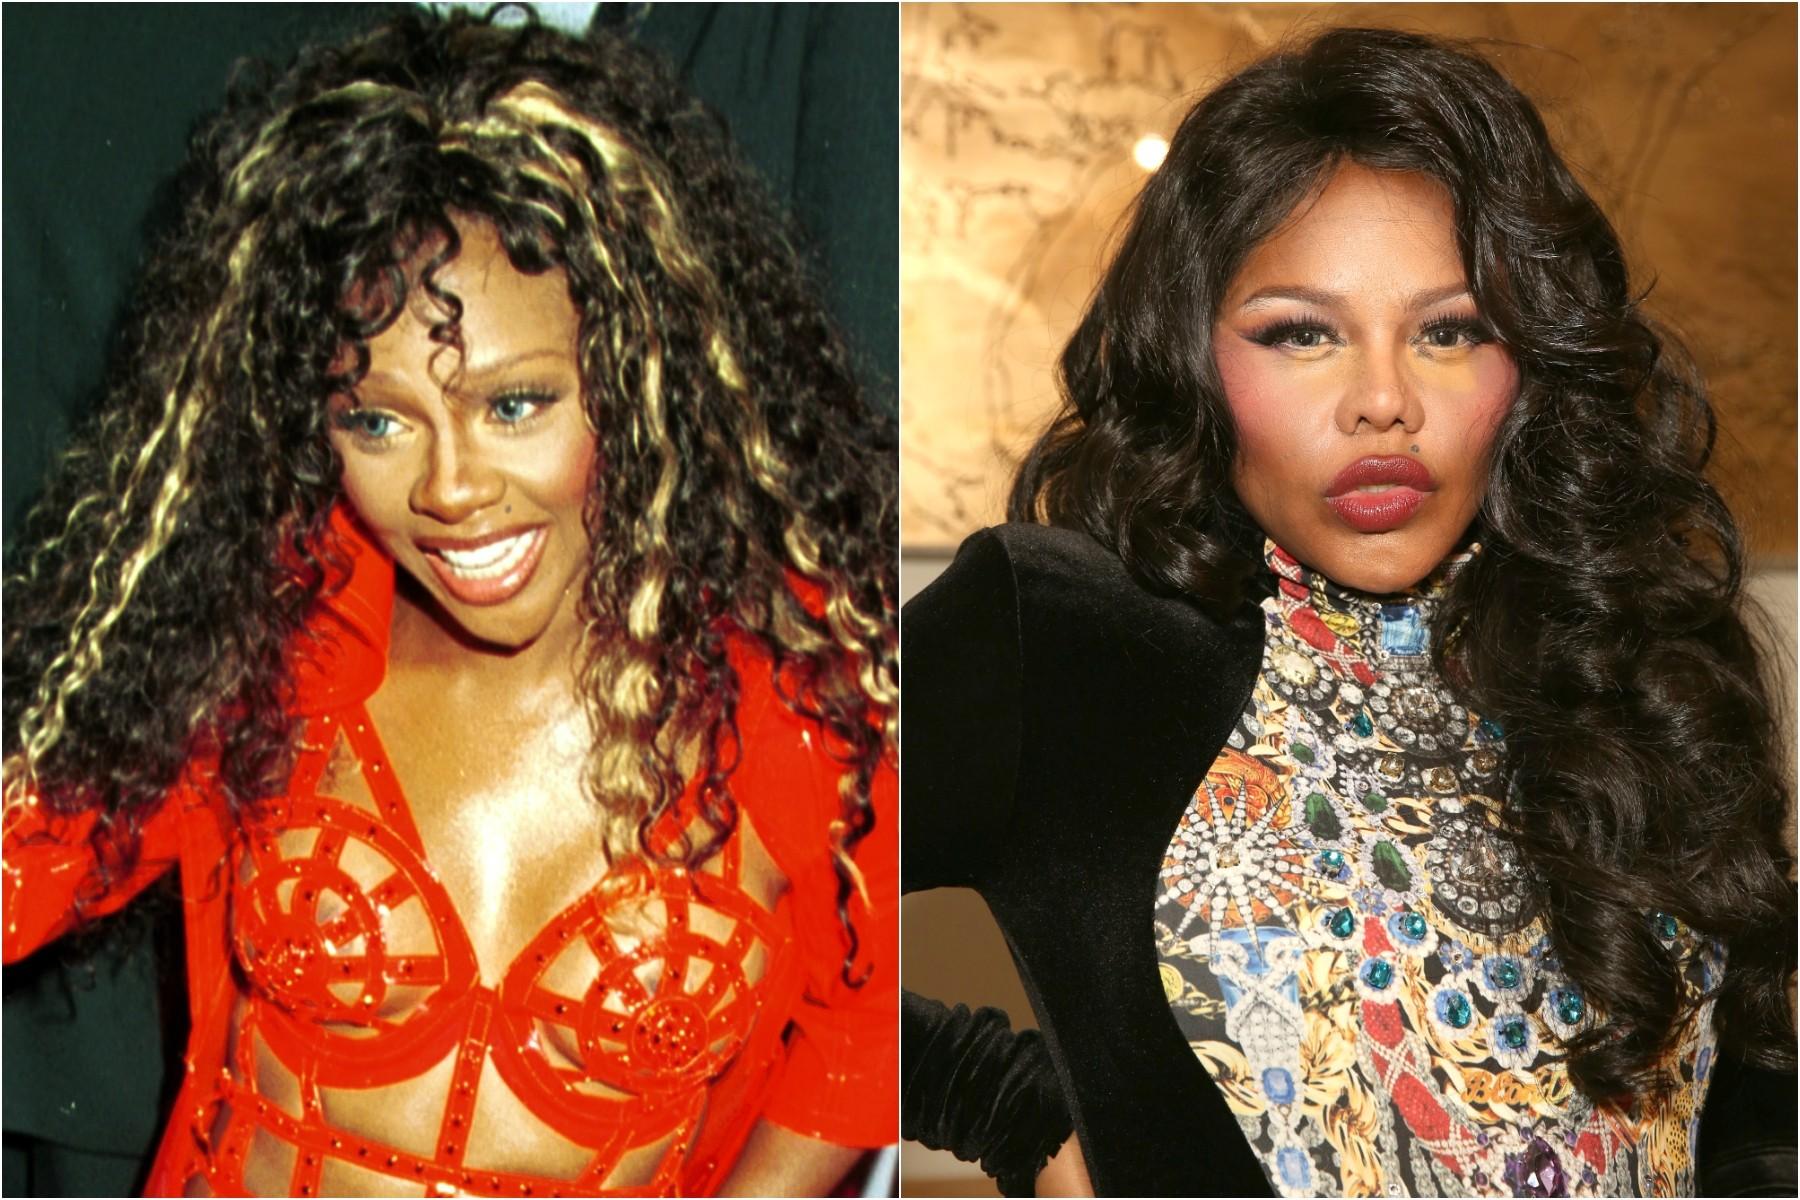 A rapper Lil' Kim em 2000 e em 2014. (Foto: Getty Images)